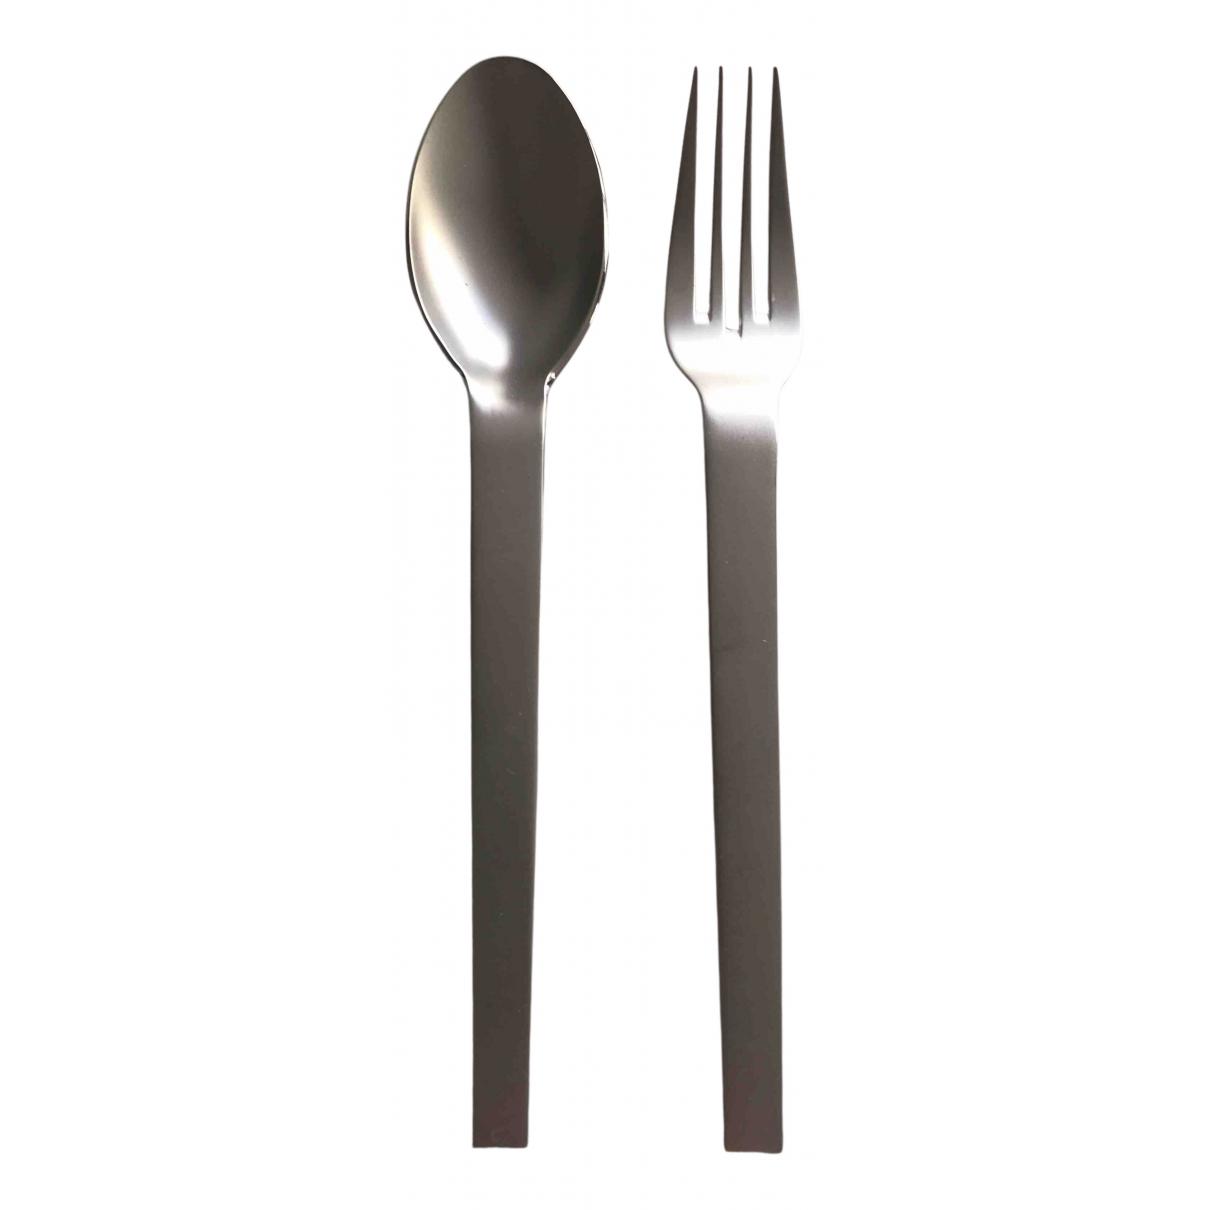 Hermes \N Tischkultur in  Silber Stahl